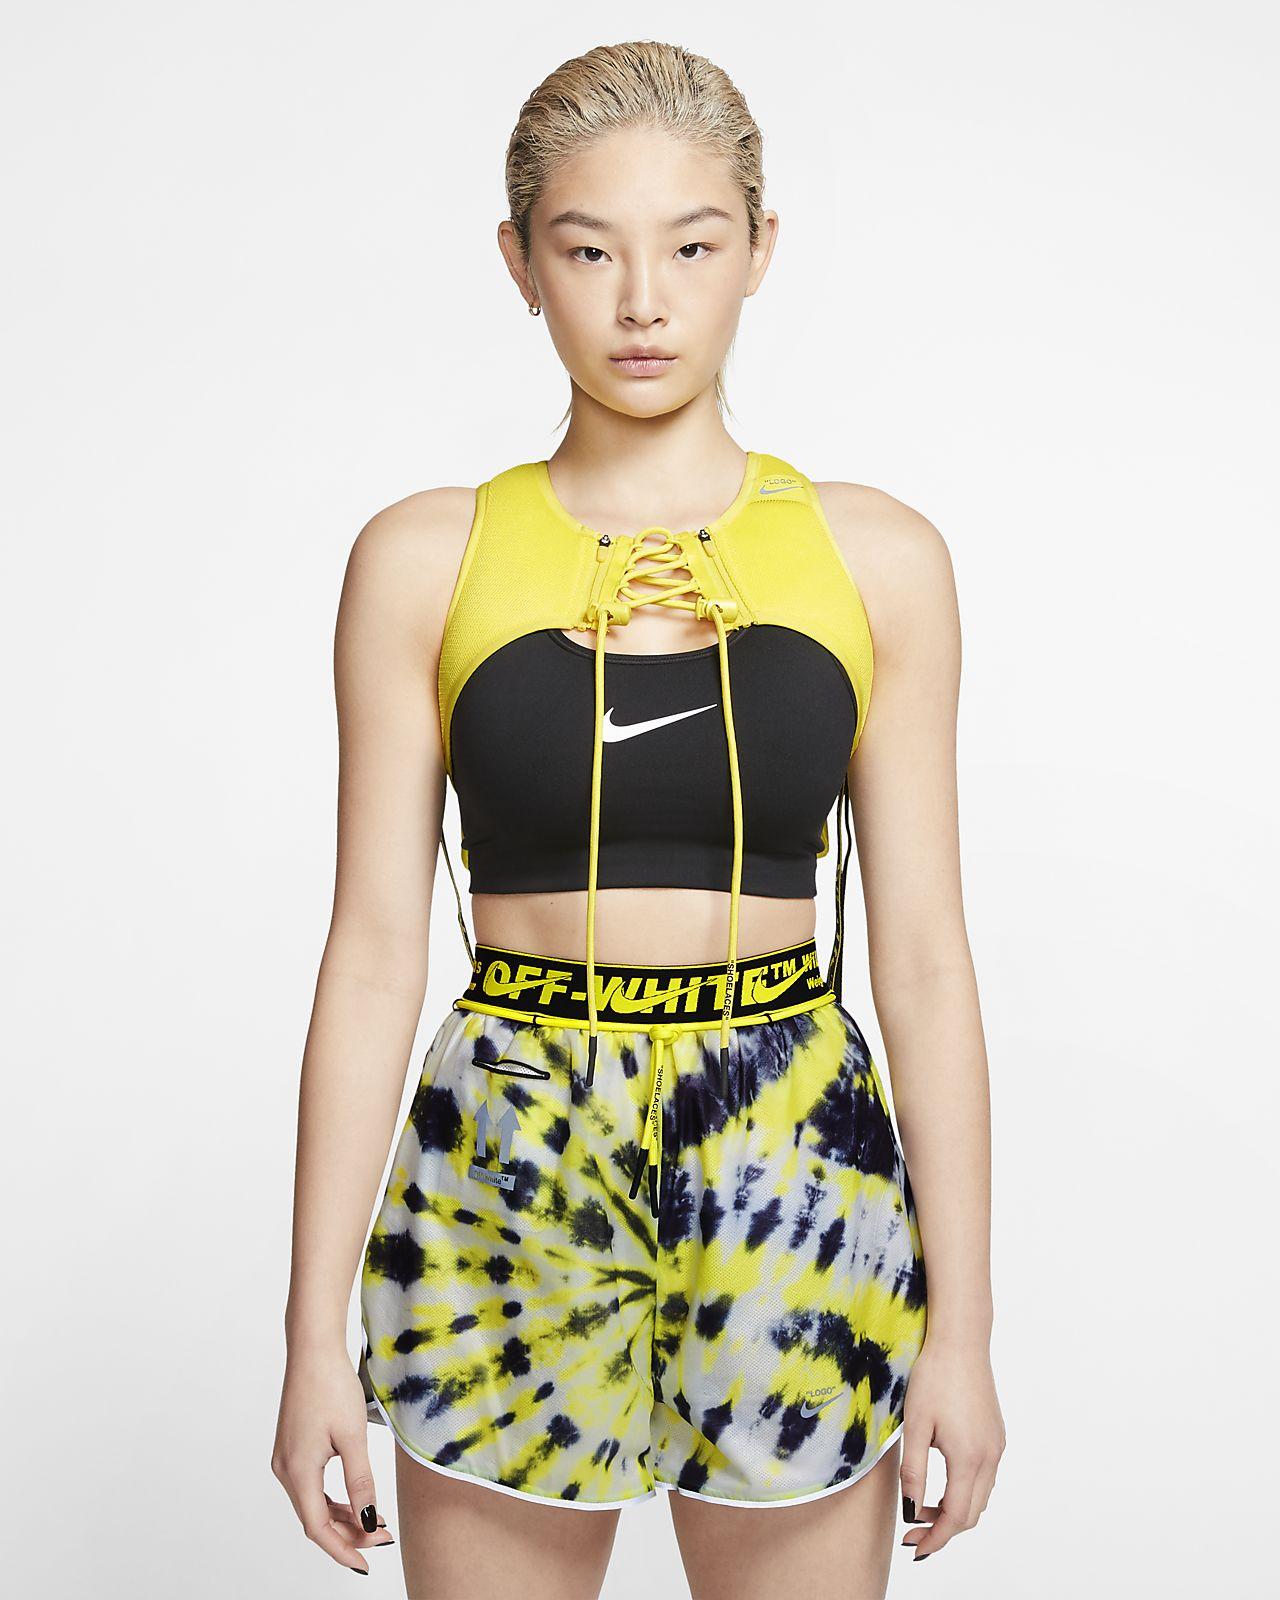 Nike x Off-White™ Women's Utility Vest